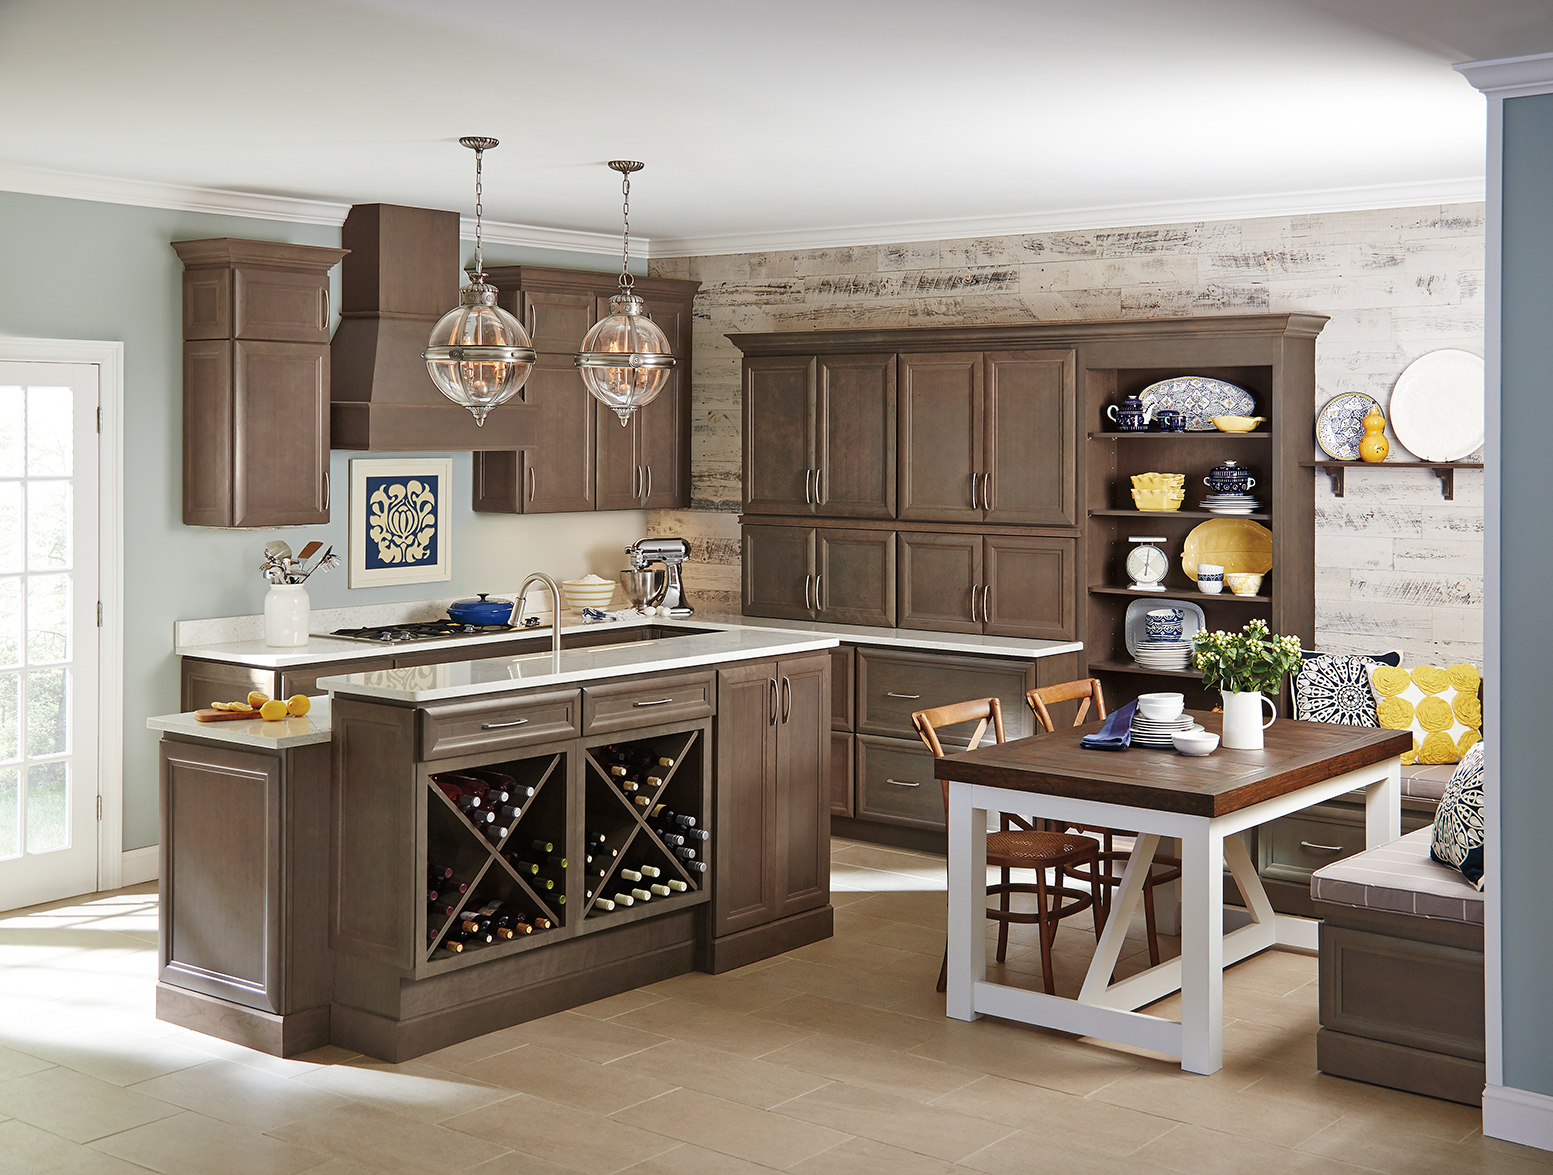 homecrest westlake anchor kitchen cabinetry.jpg